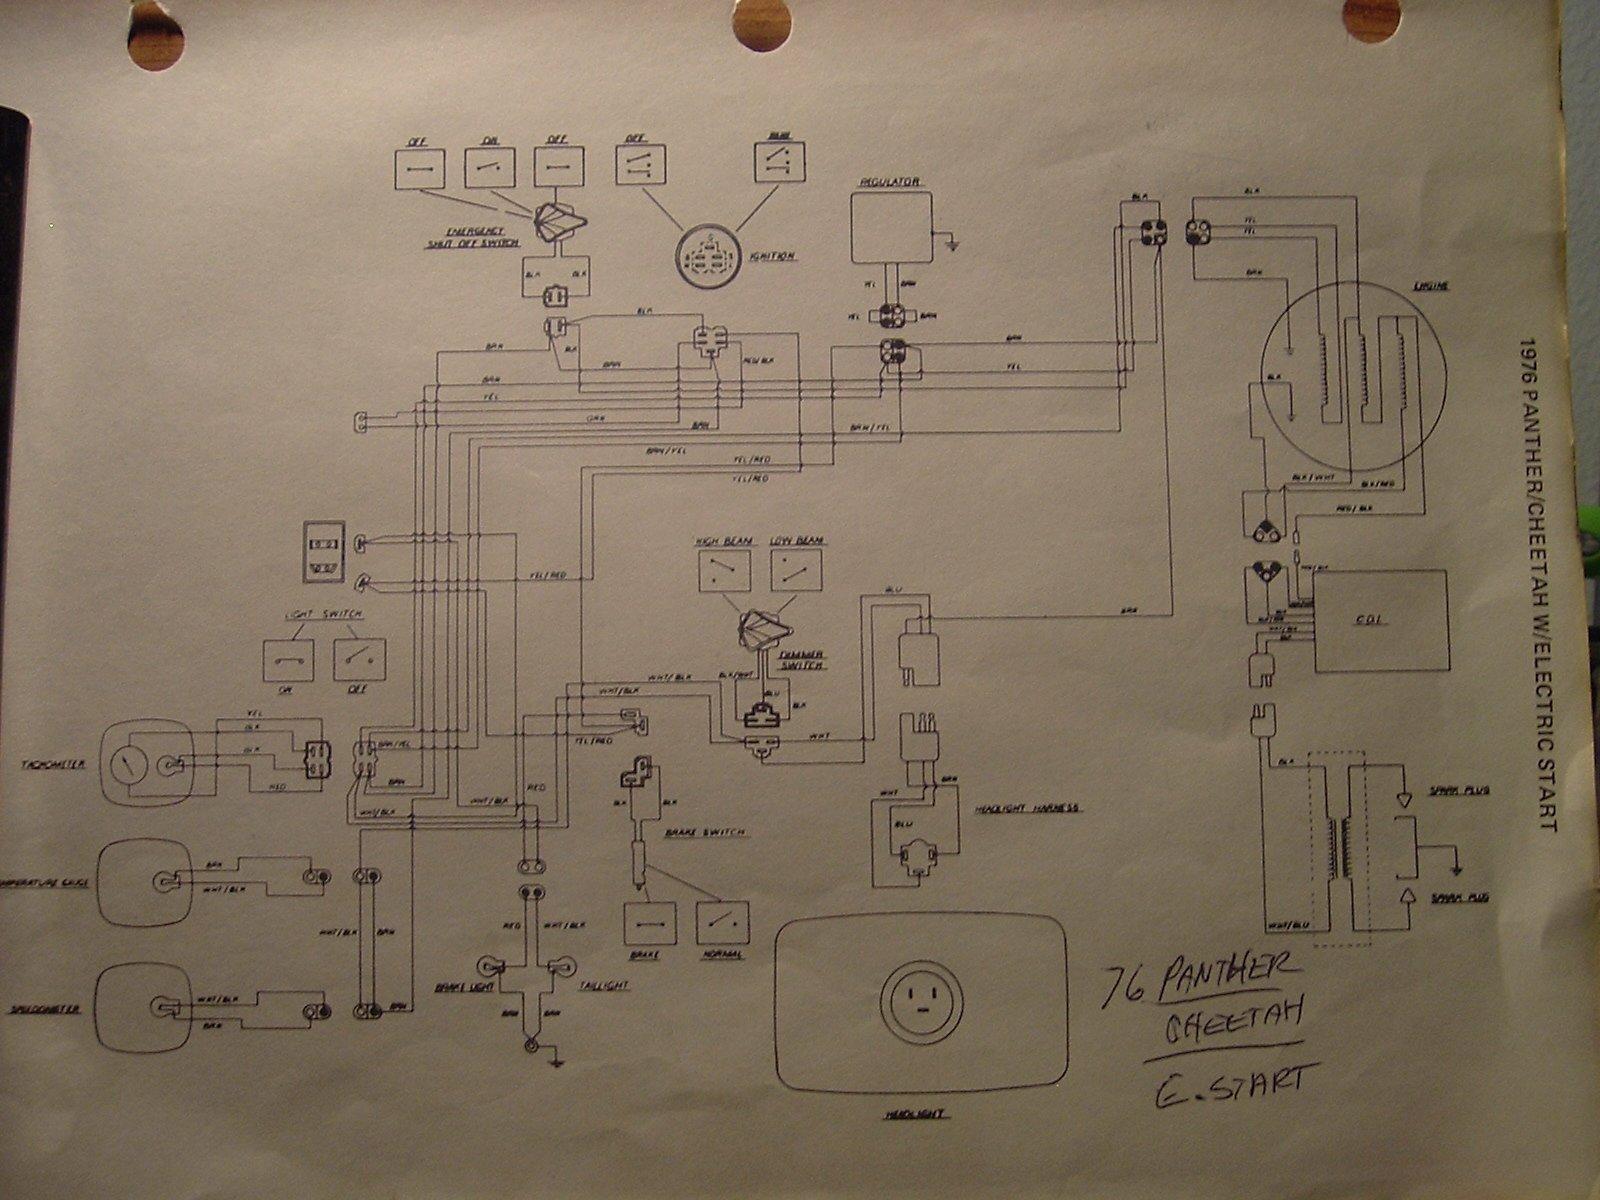 hight resolution of  generic kawasaki snowmobile wiring diagrams wiring diagram 1973 puma wiring diagram toolboxwiring diagram 1973 puma wiring diagram meta wiring diagram